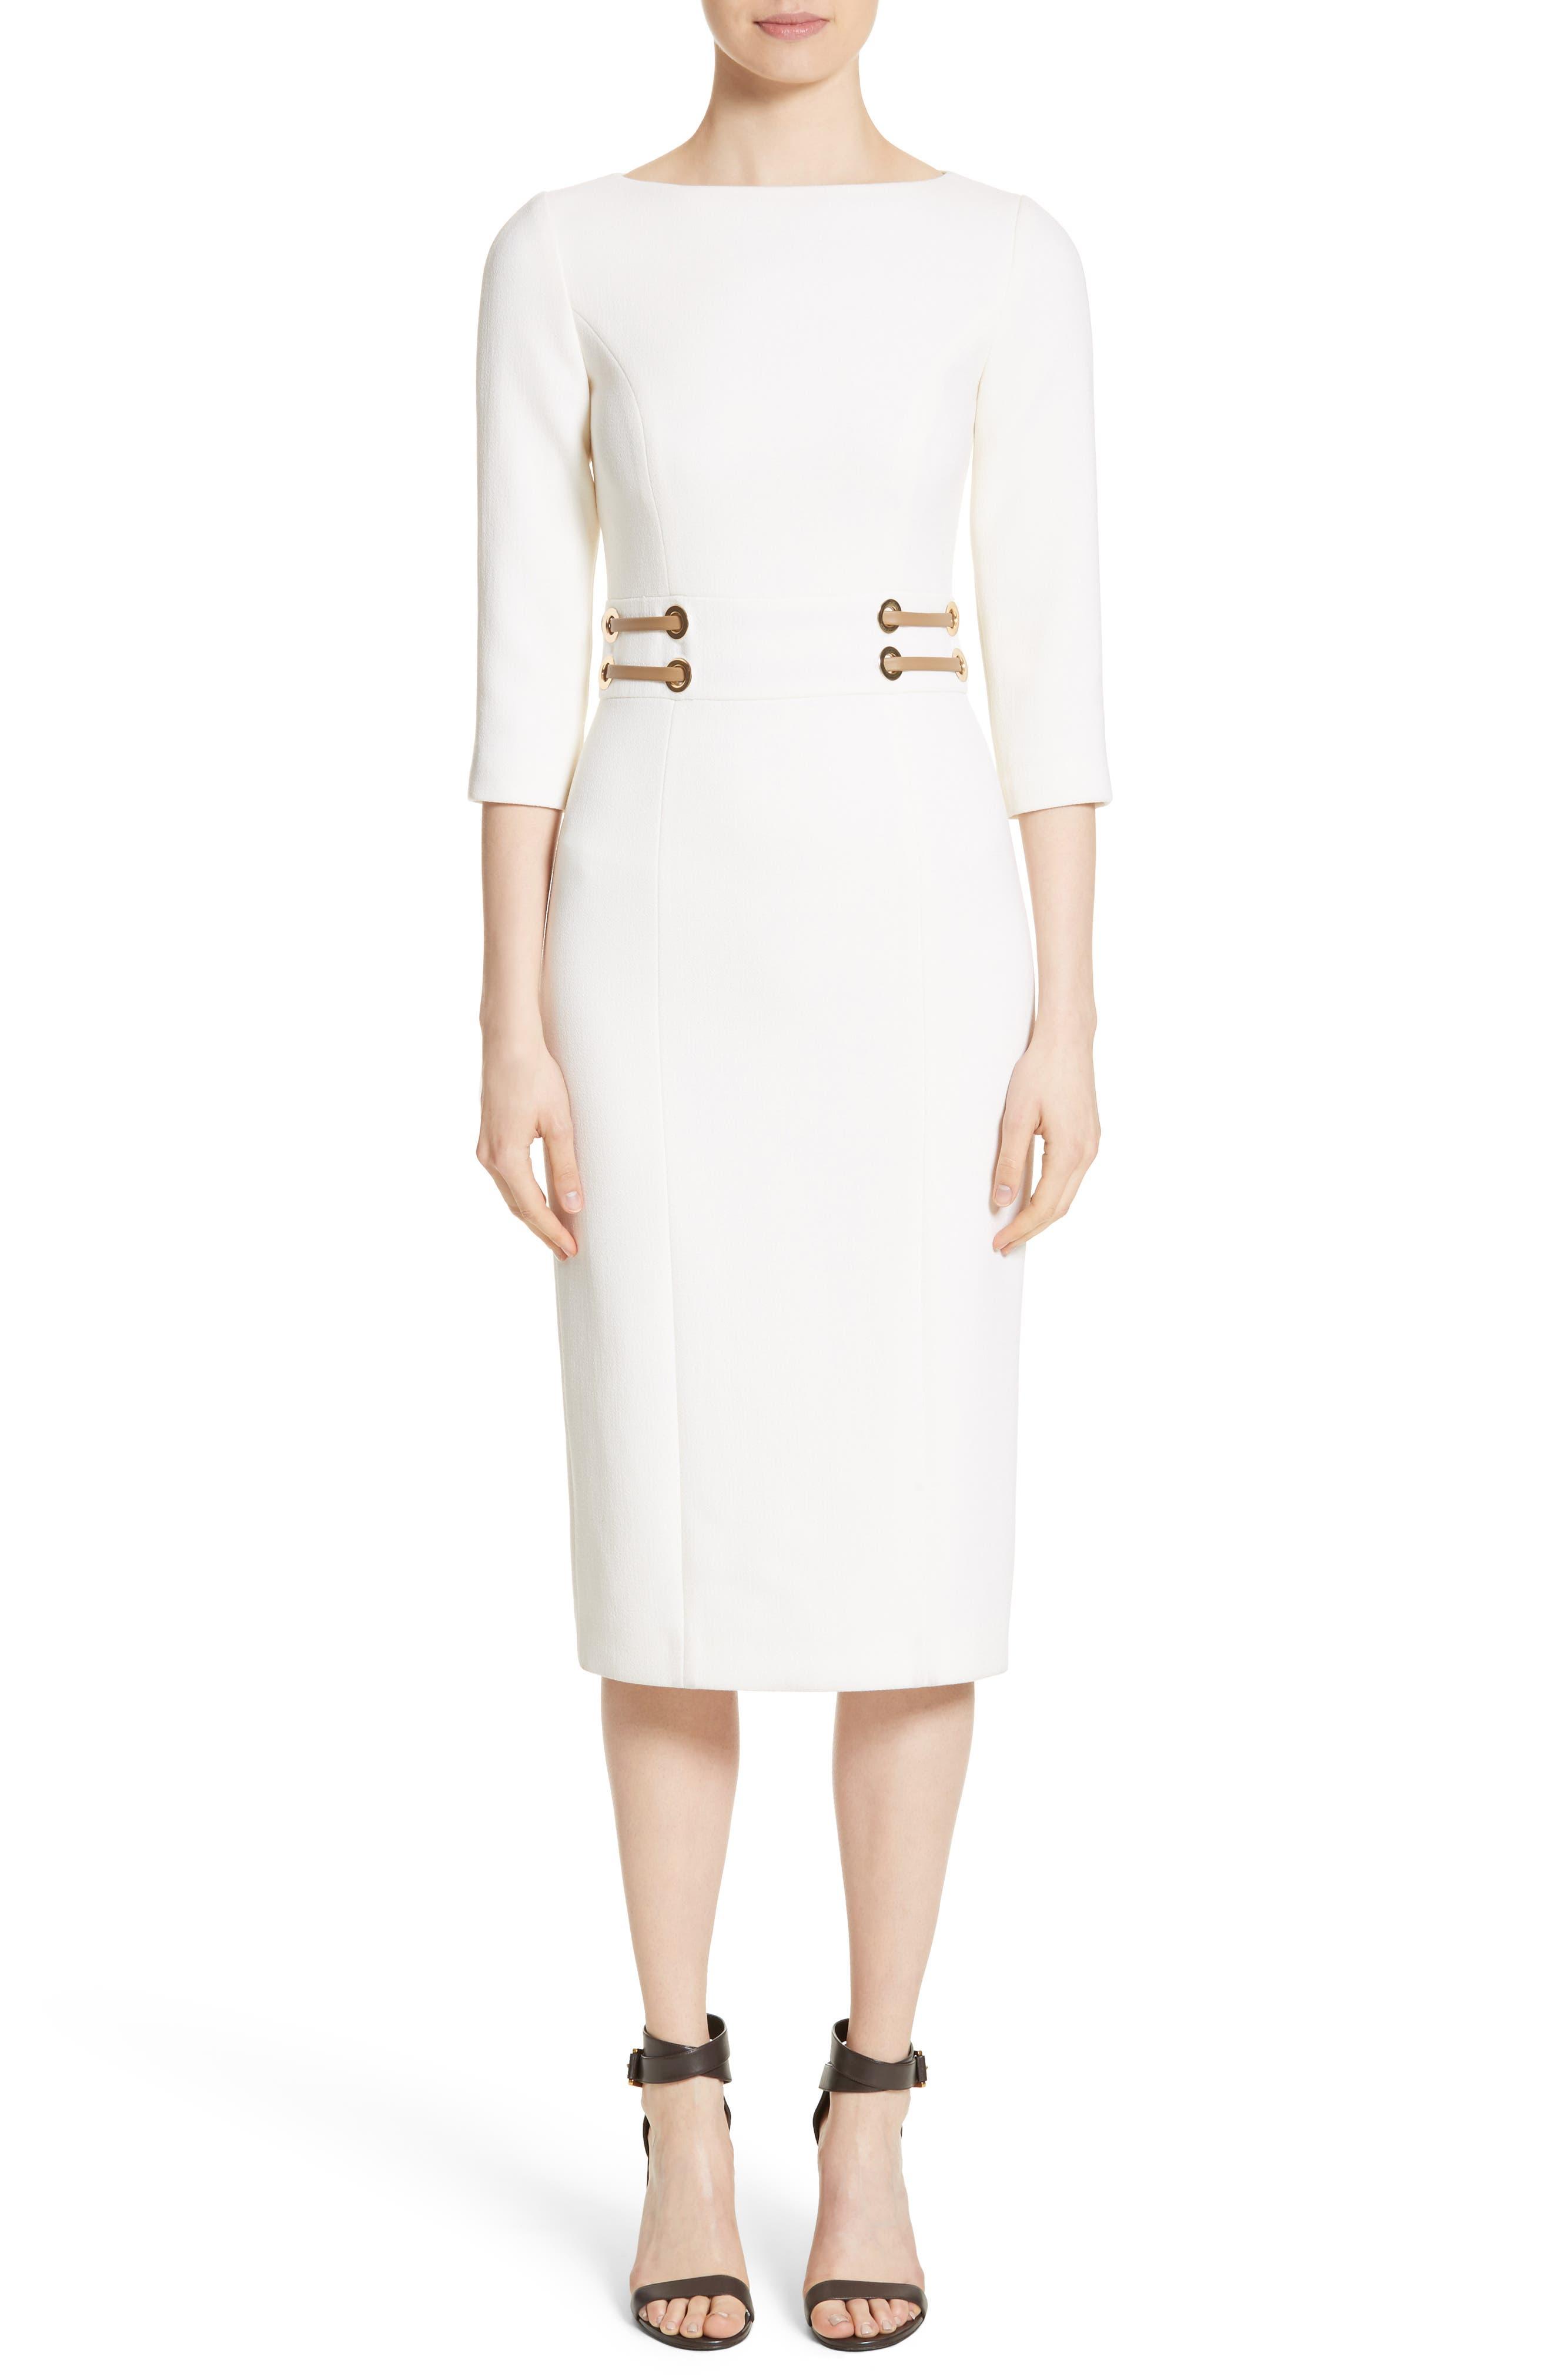 Main Image - Michael Kors Leather Trim Stretch Bouclé Crepe Sheath Dress